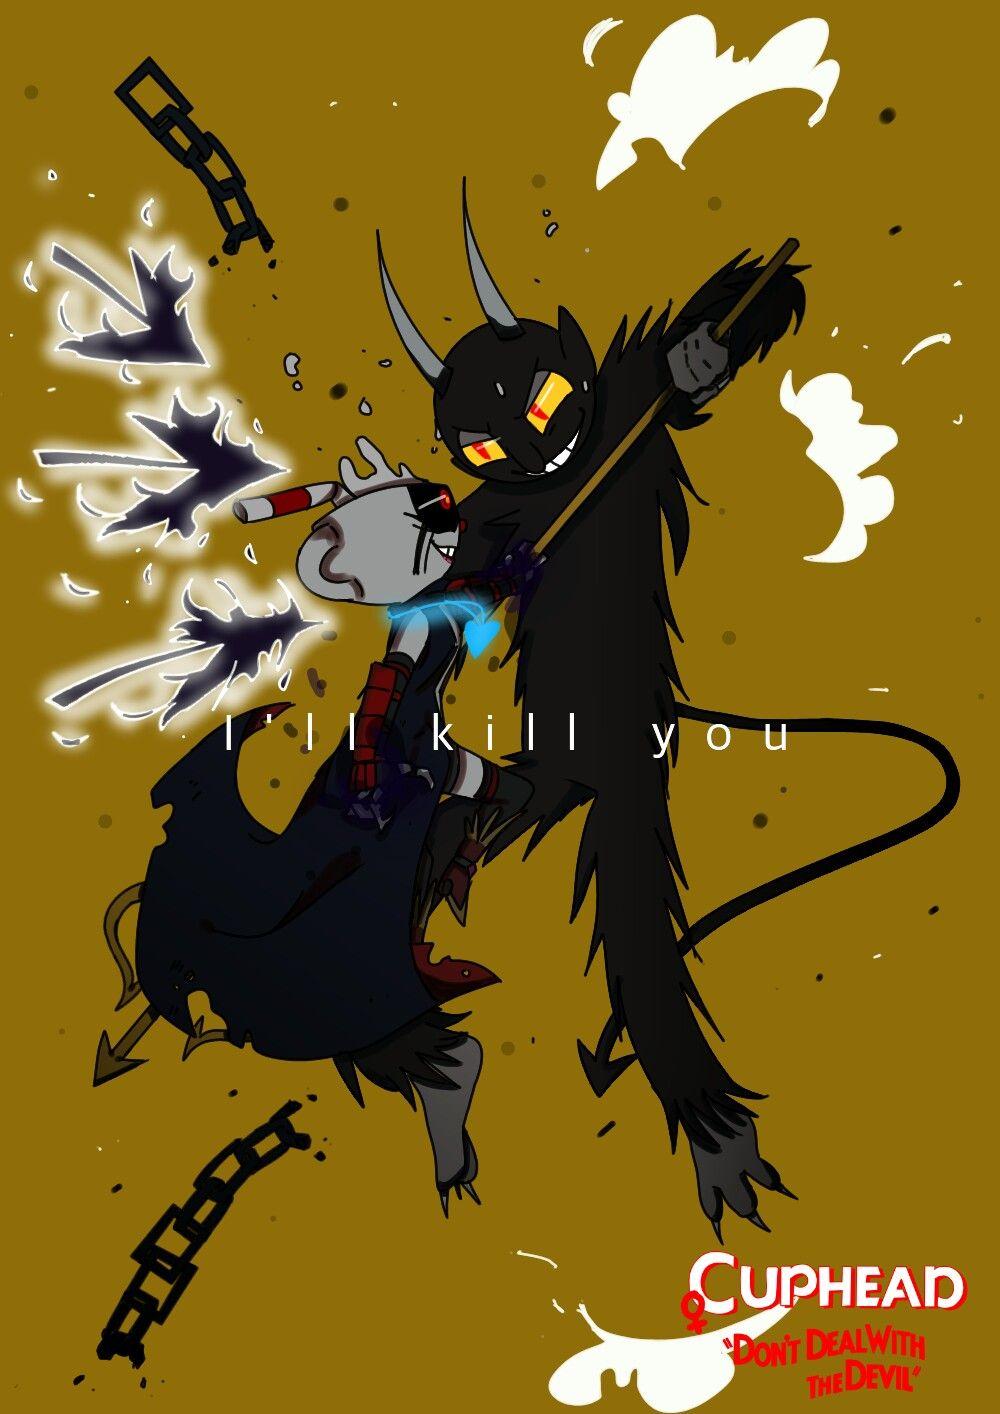 Femalecuphead Darkangel Vs The Devil Femalecuphead